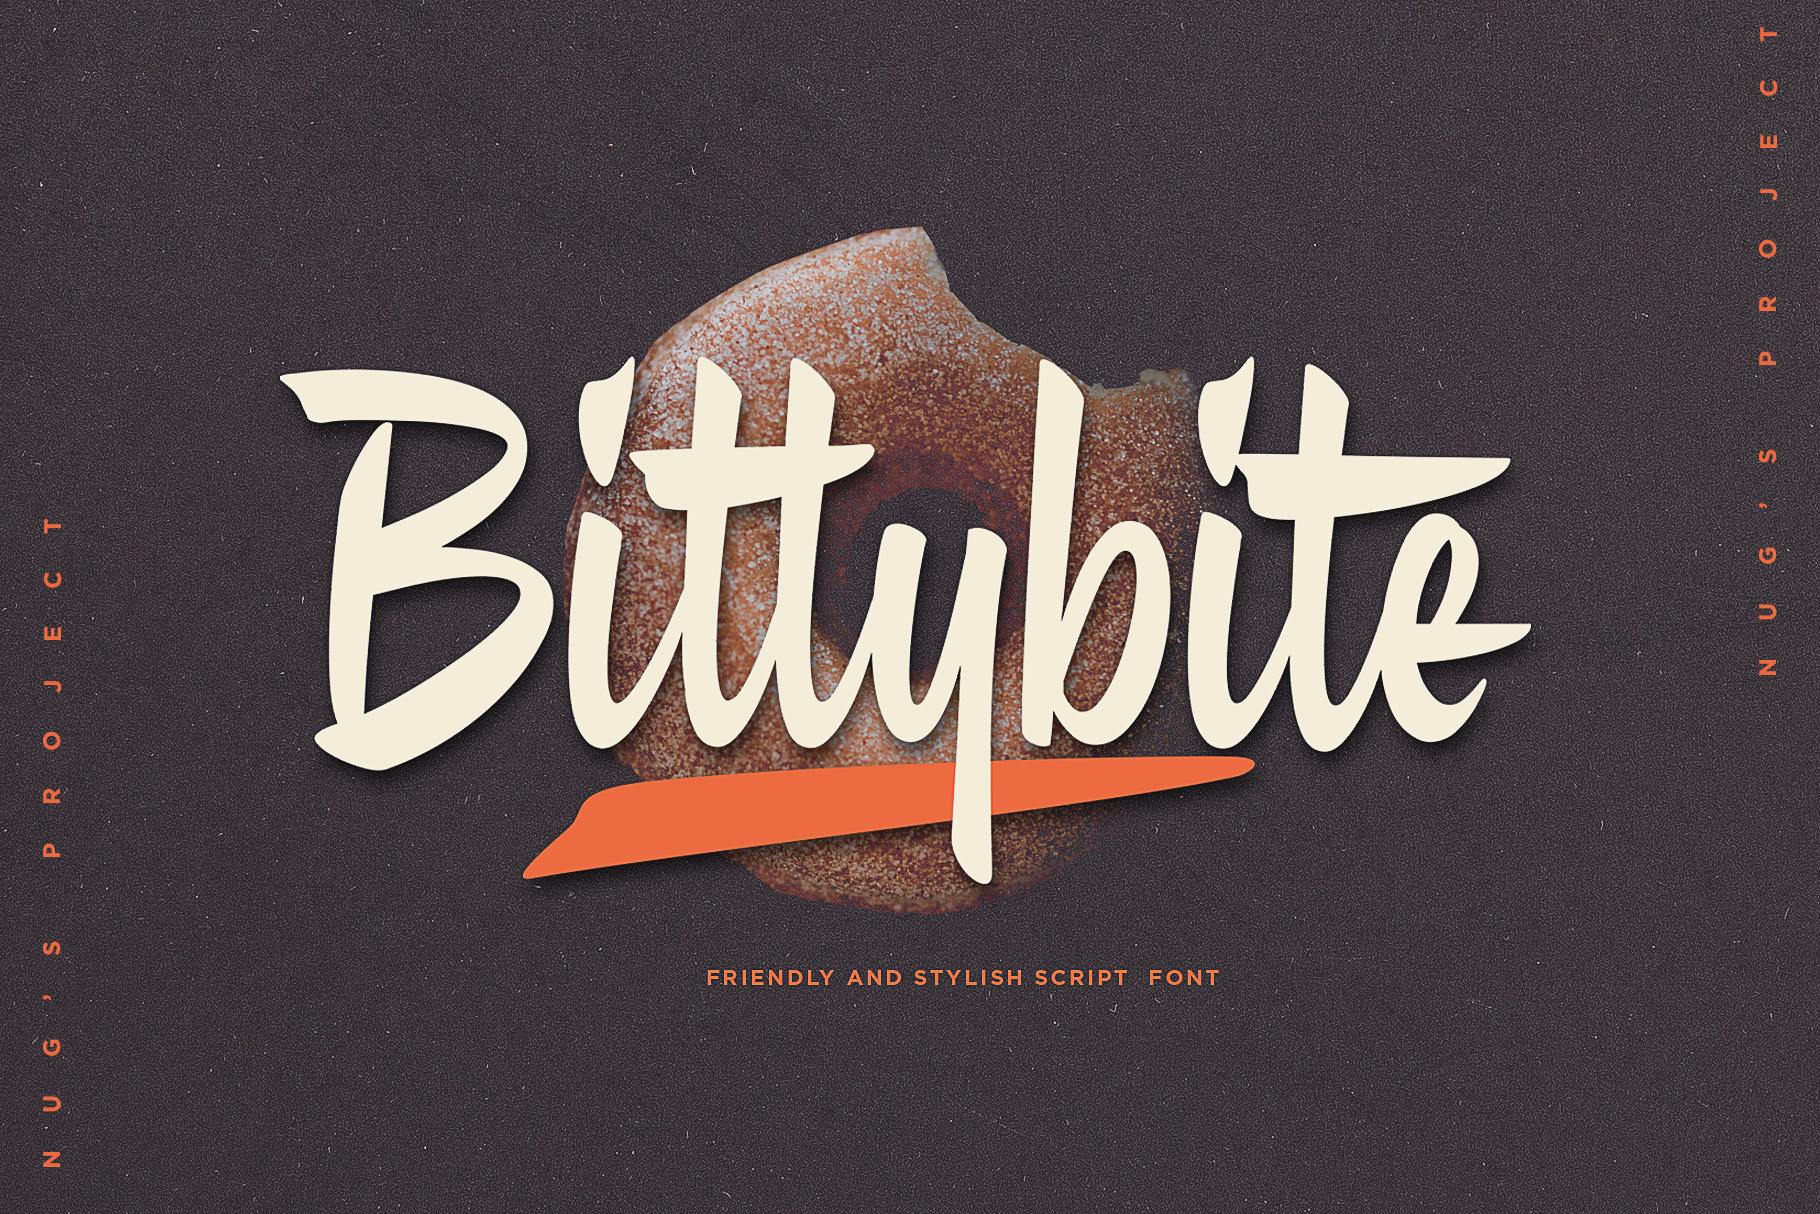 Bittybite example image 1